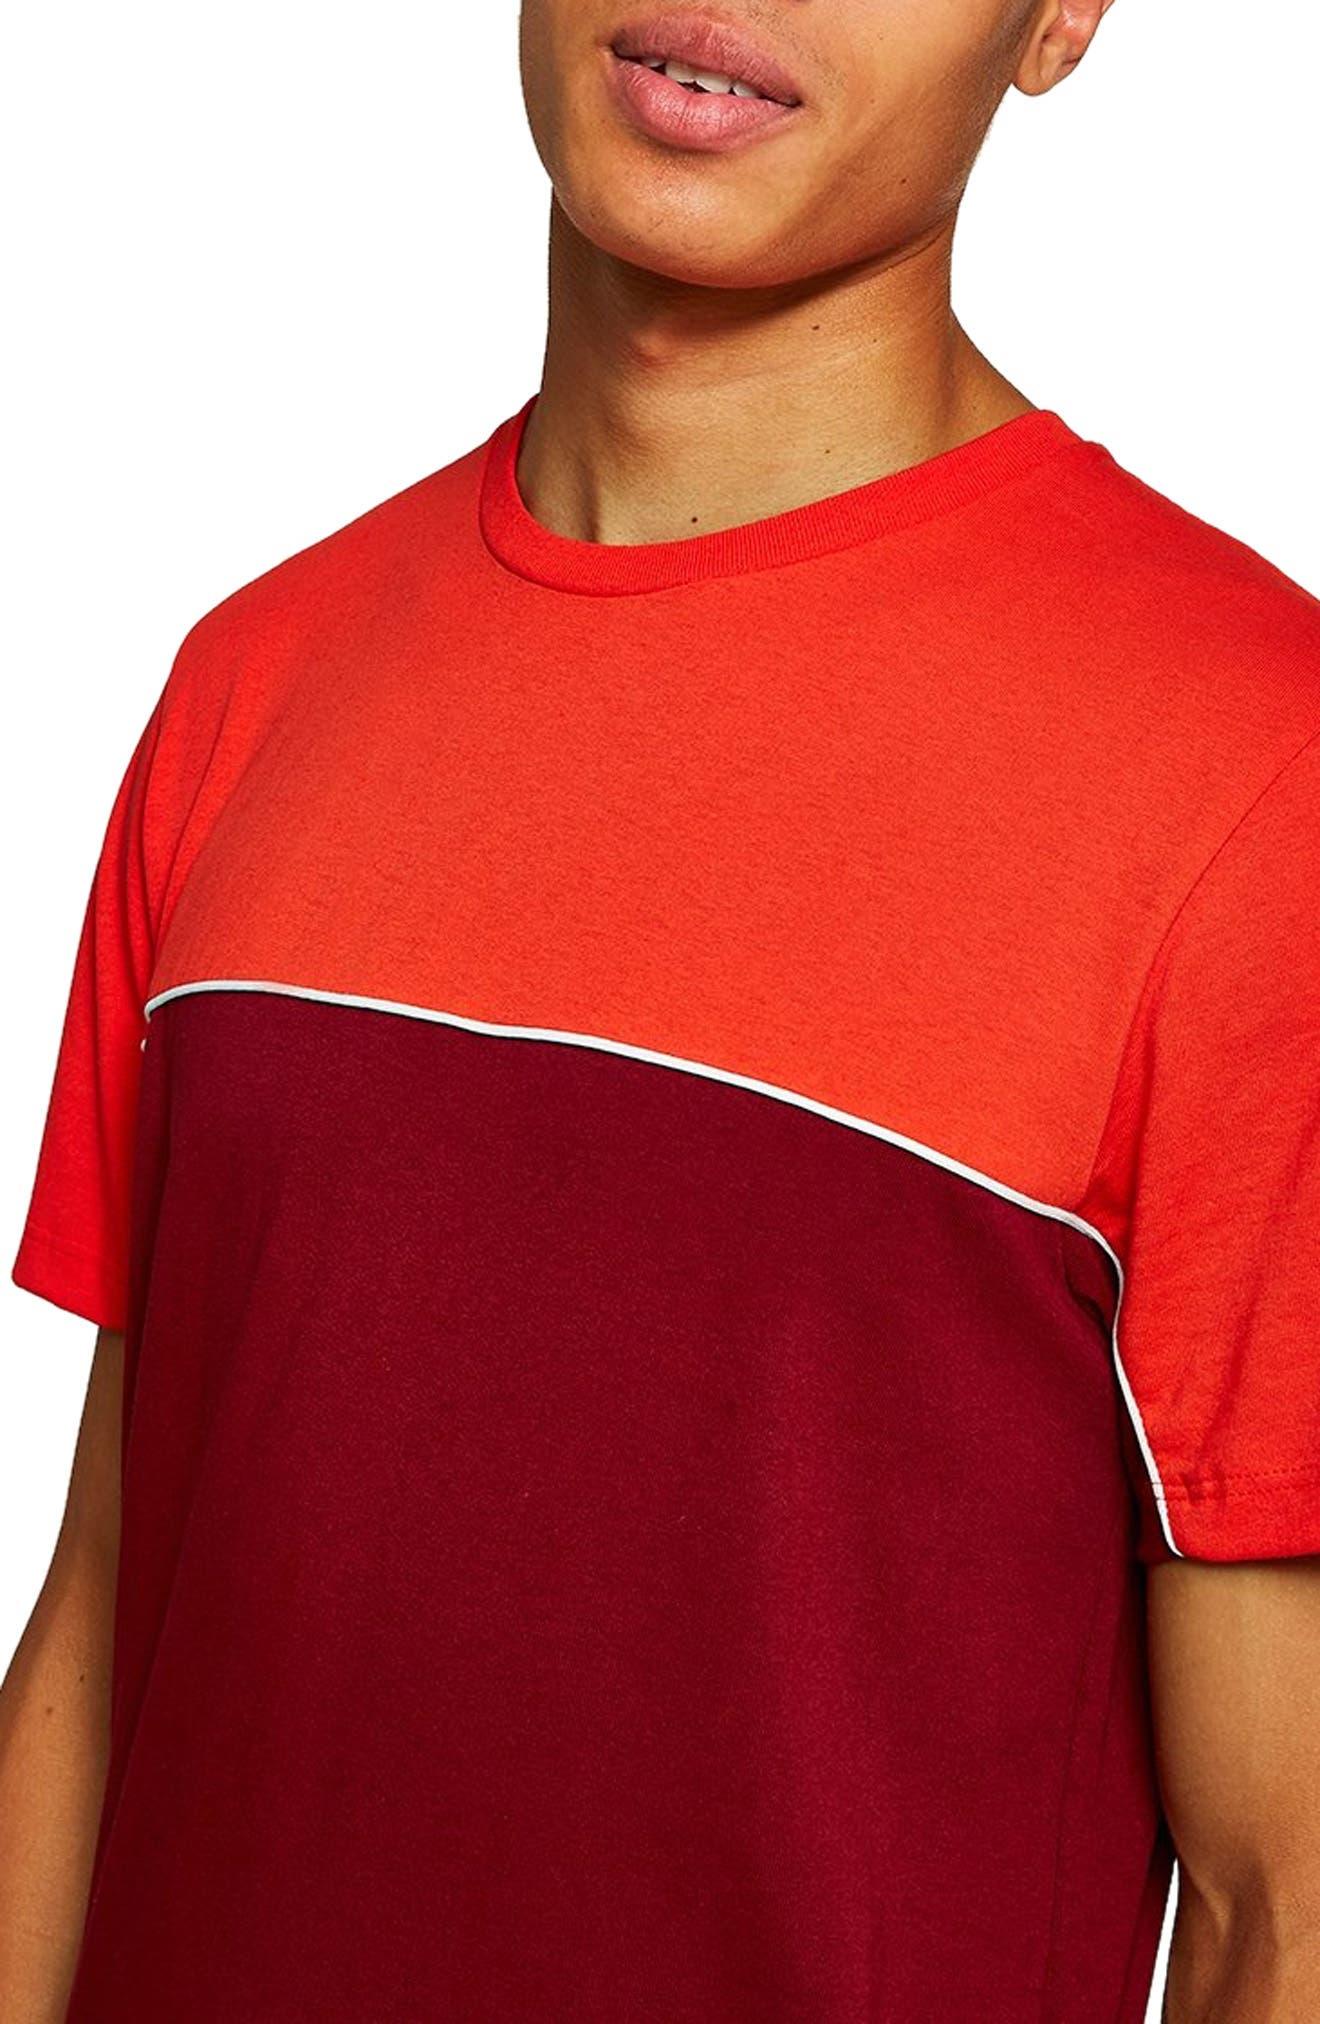 Colorblock T-Shirt,                             Main thumbnail 1, color,                             RED MULTI